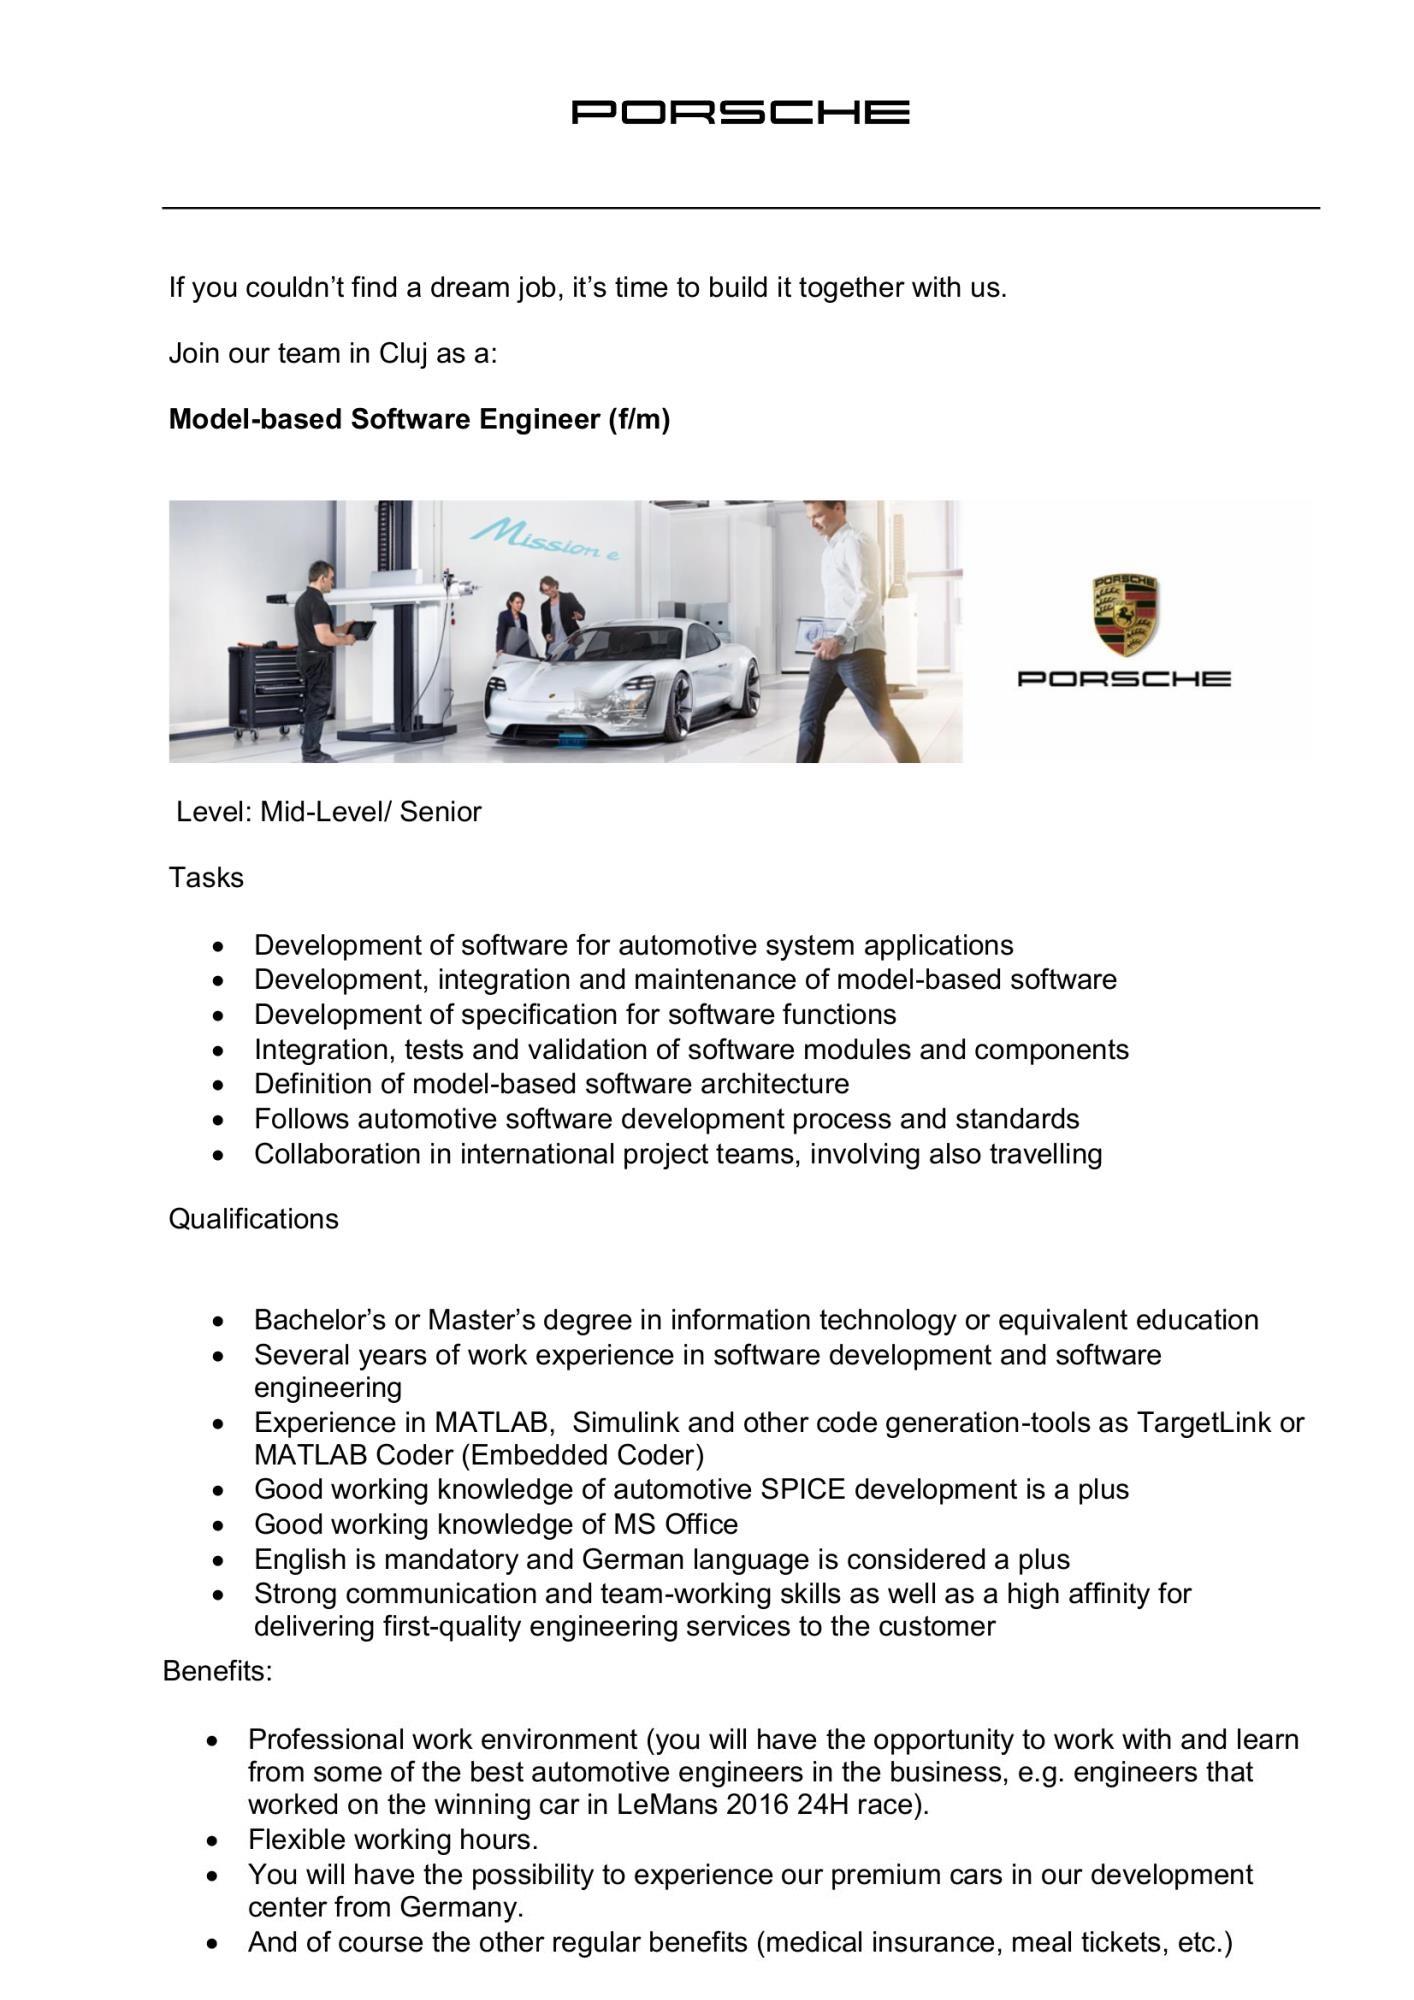 Model-based Software Engineer (f/m)